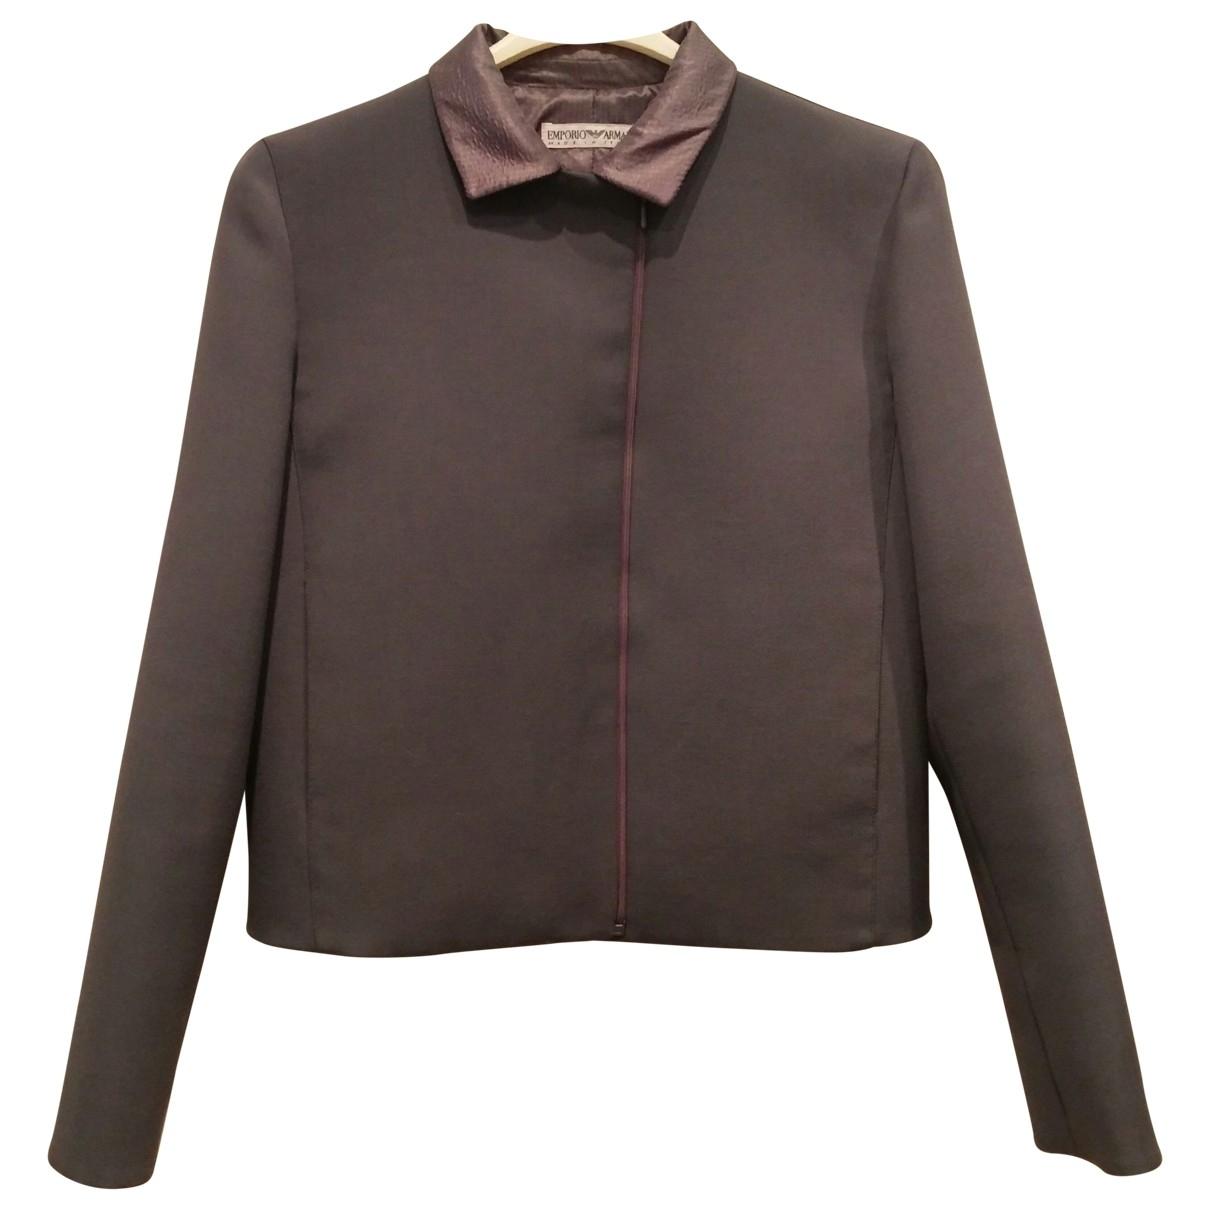 Emporio Armani \N Grey jacket for Women 42 IT